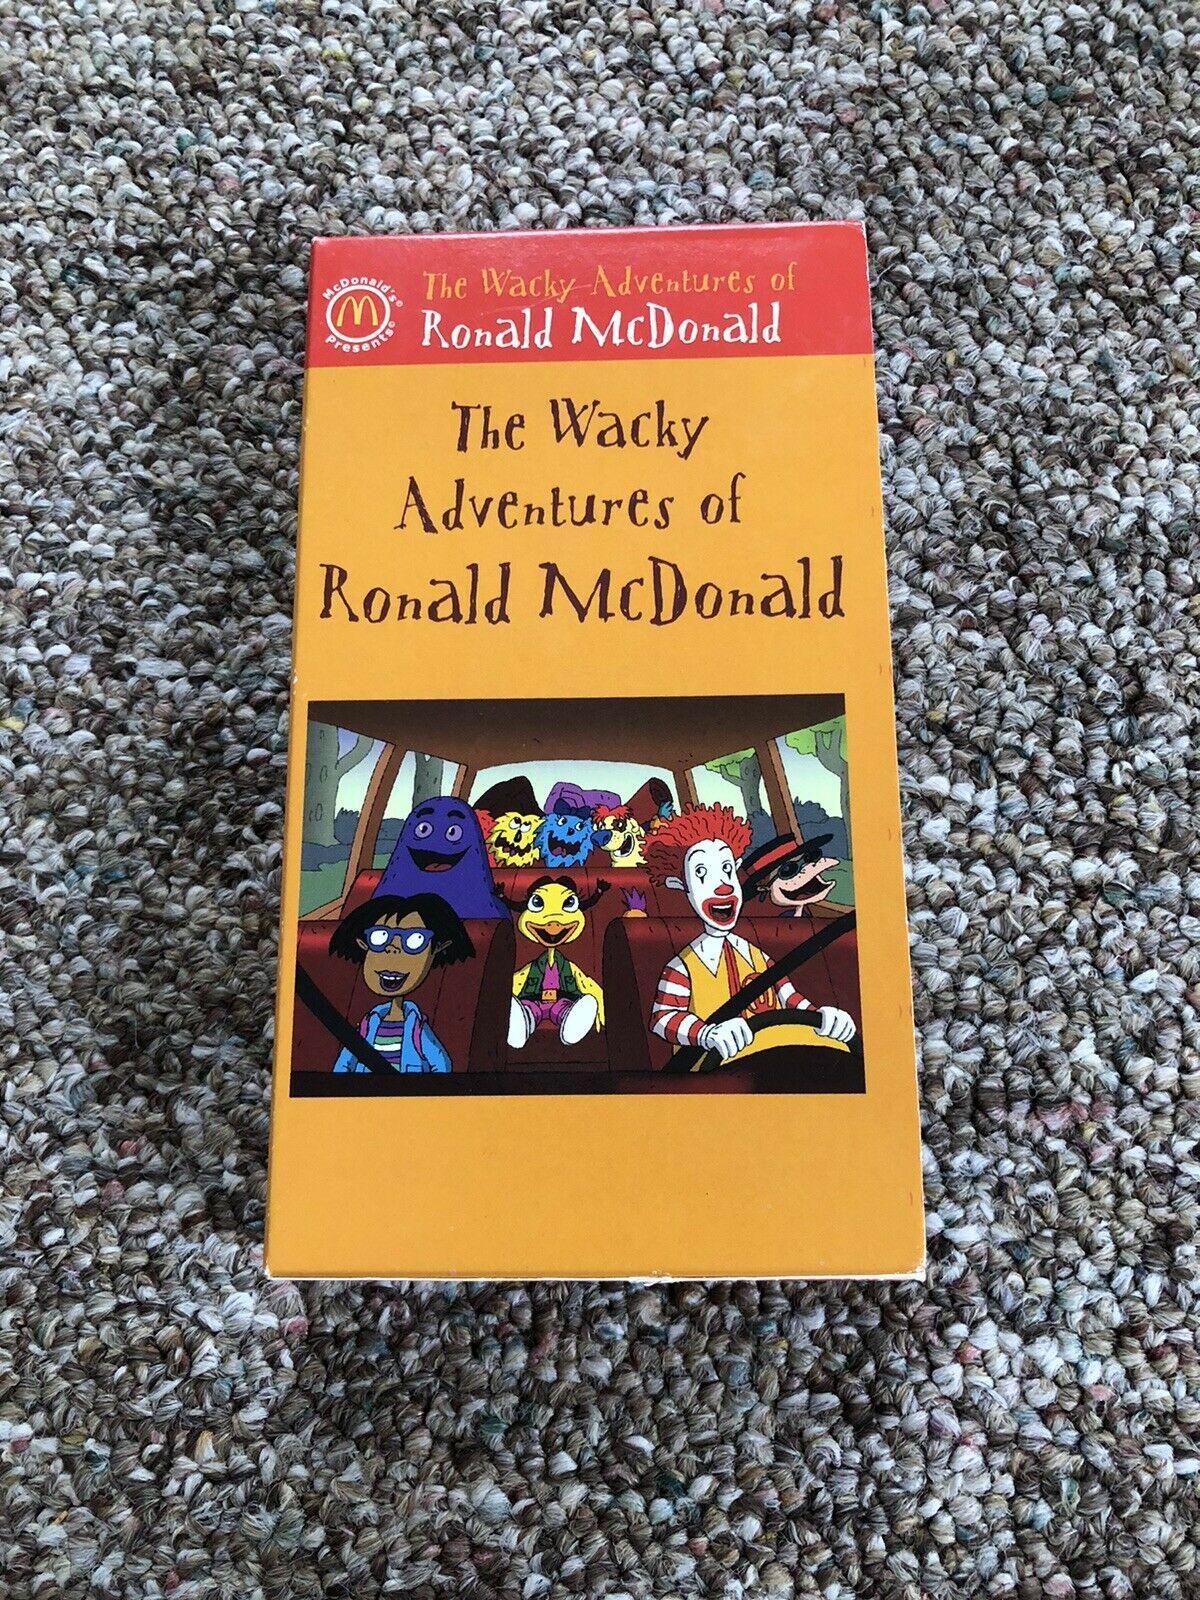 The Wacky Adventures of Ronald McDonald: The Legend of McDonaldland Loch (2003 VHS)